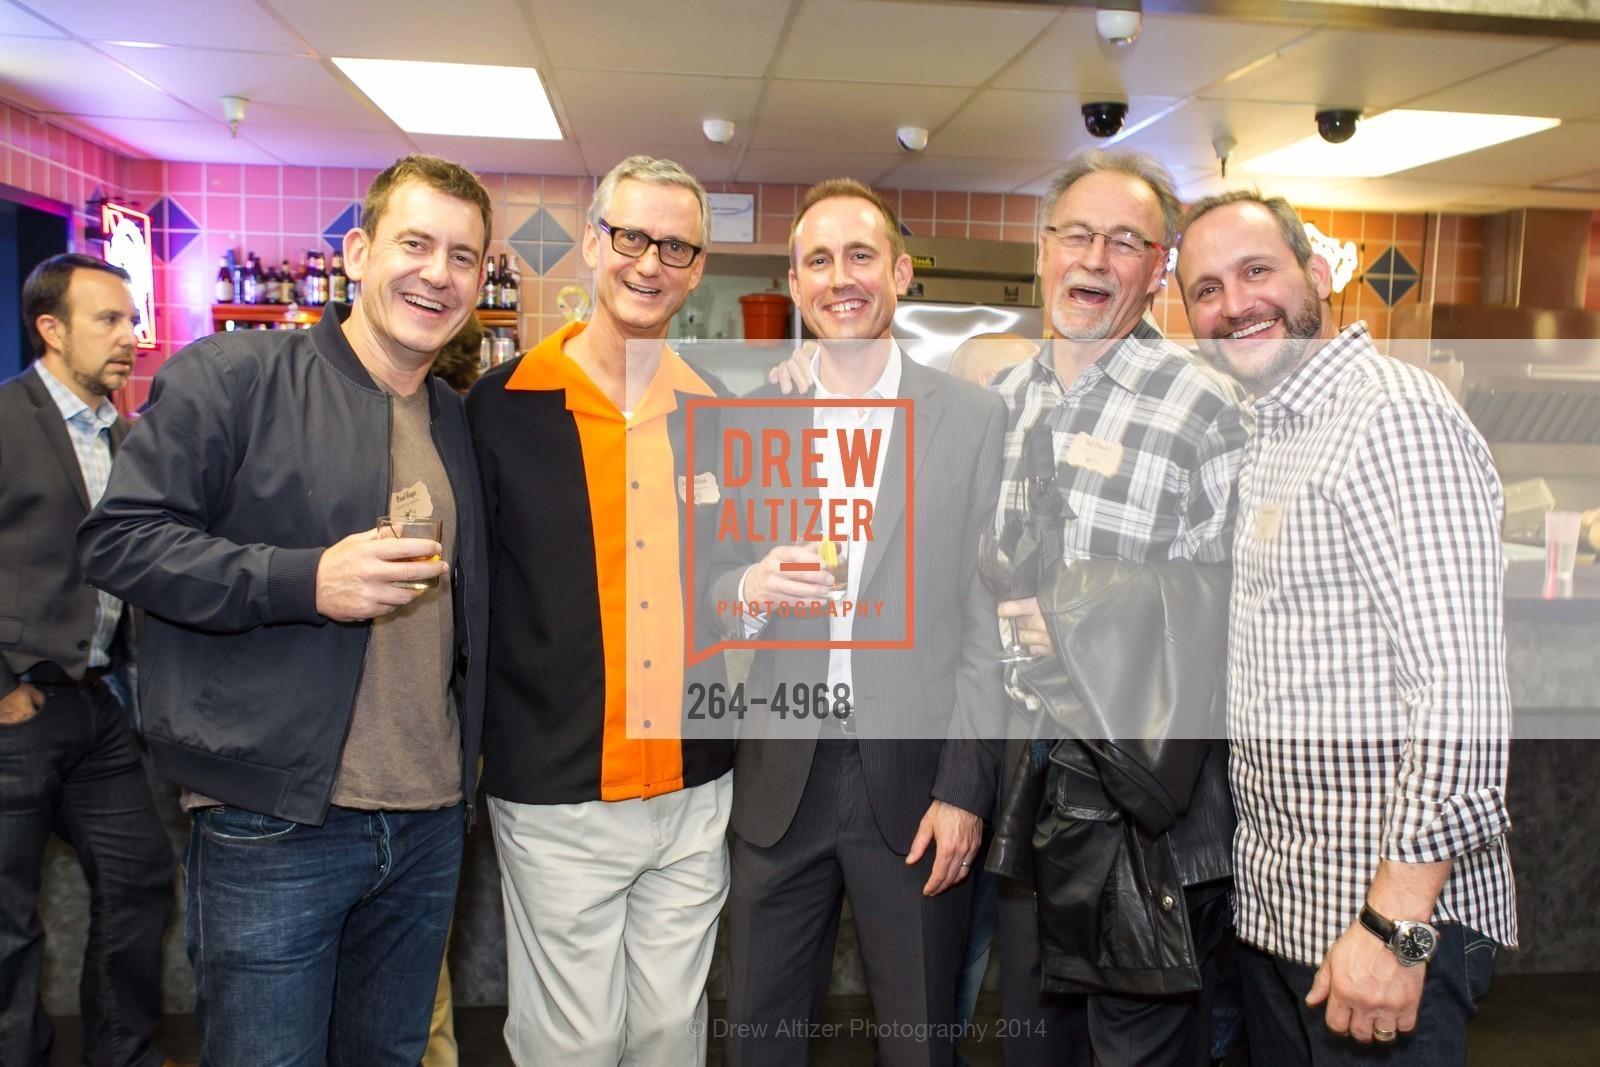 Brad Hayes, David Whiteside, Tom Cruise, Rob Stewart, Brian Gianinno, Photo #264-4968